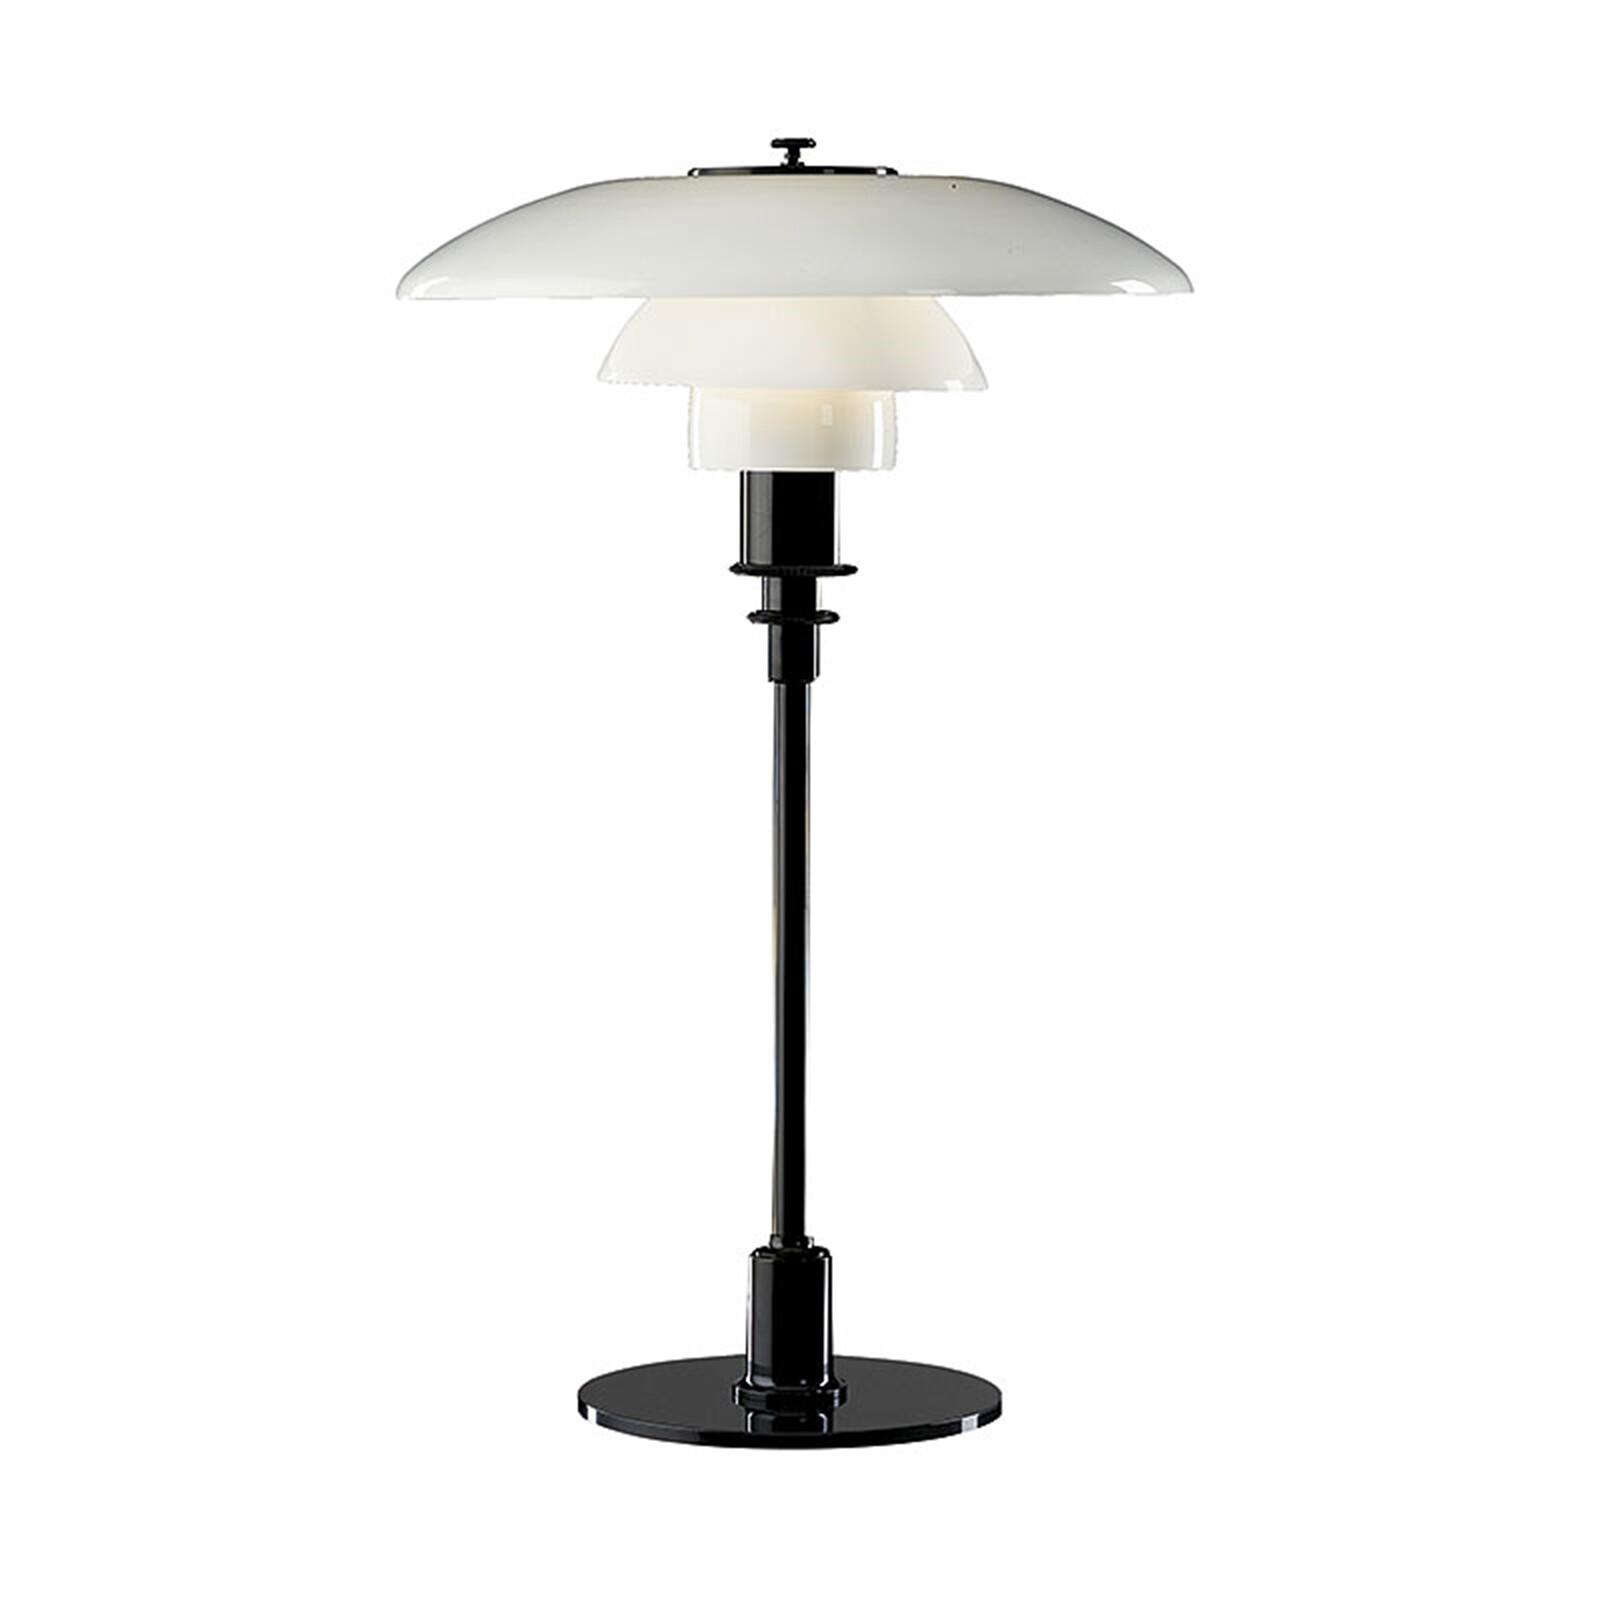 PH 3/2 Bordlampe Sort Metalliseret - Louis Poulsen thumbnail